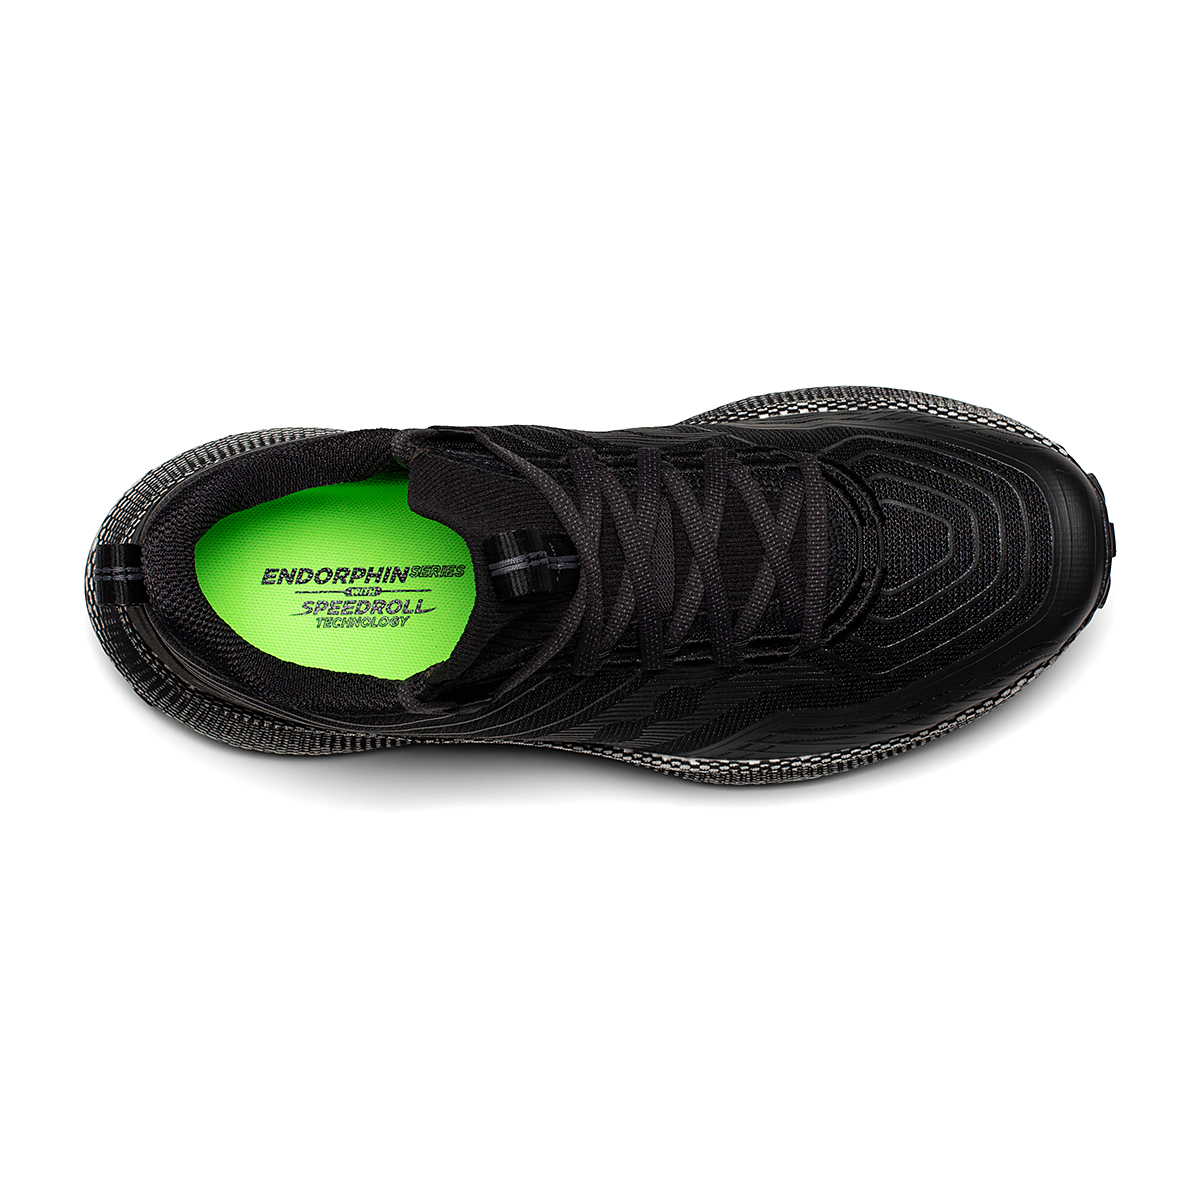 Men's Saucony Endorphin Trail Running Shoe - Color: Black/Gravel - Size: 7 - Width: Regular, Black/Gravel, large, image 3